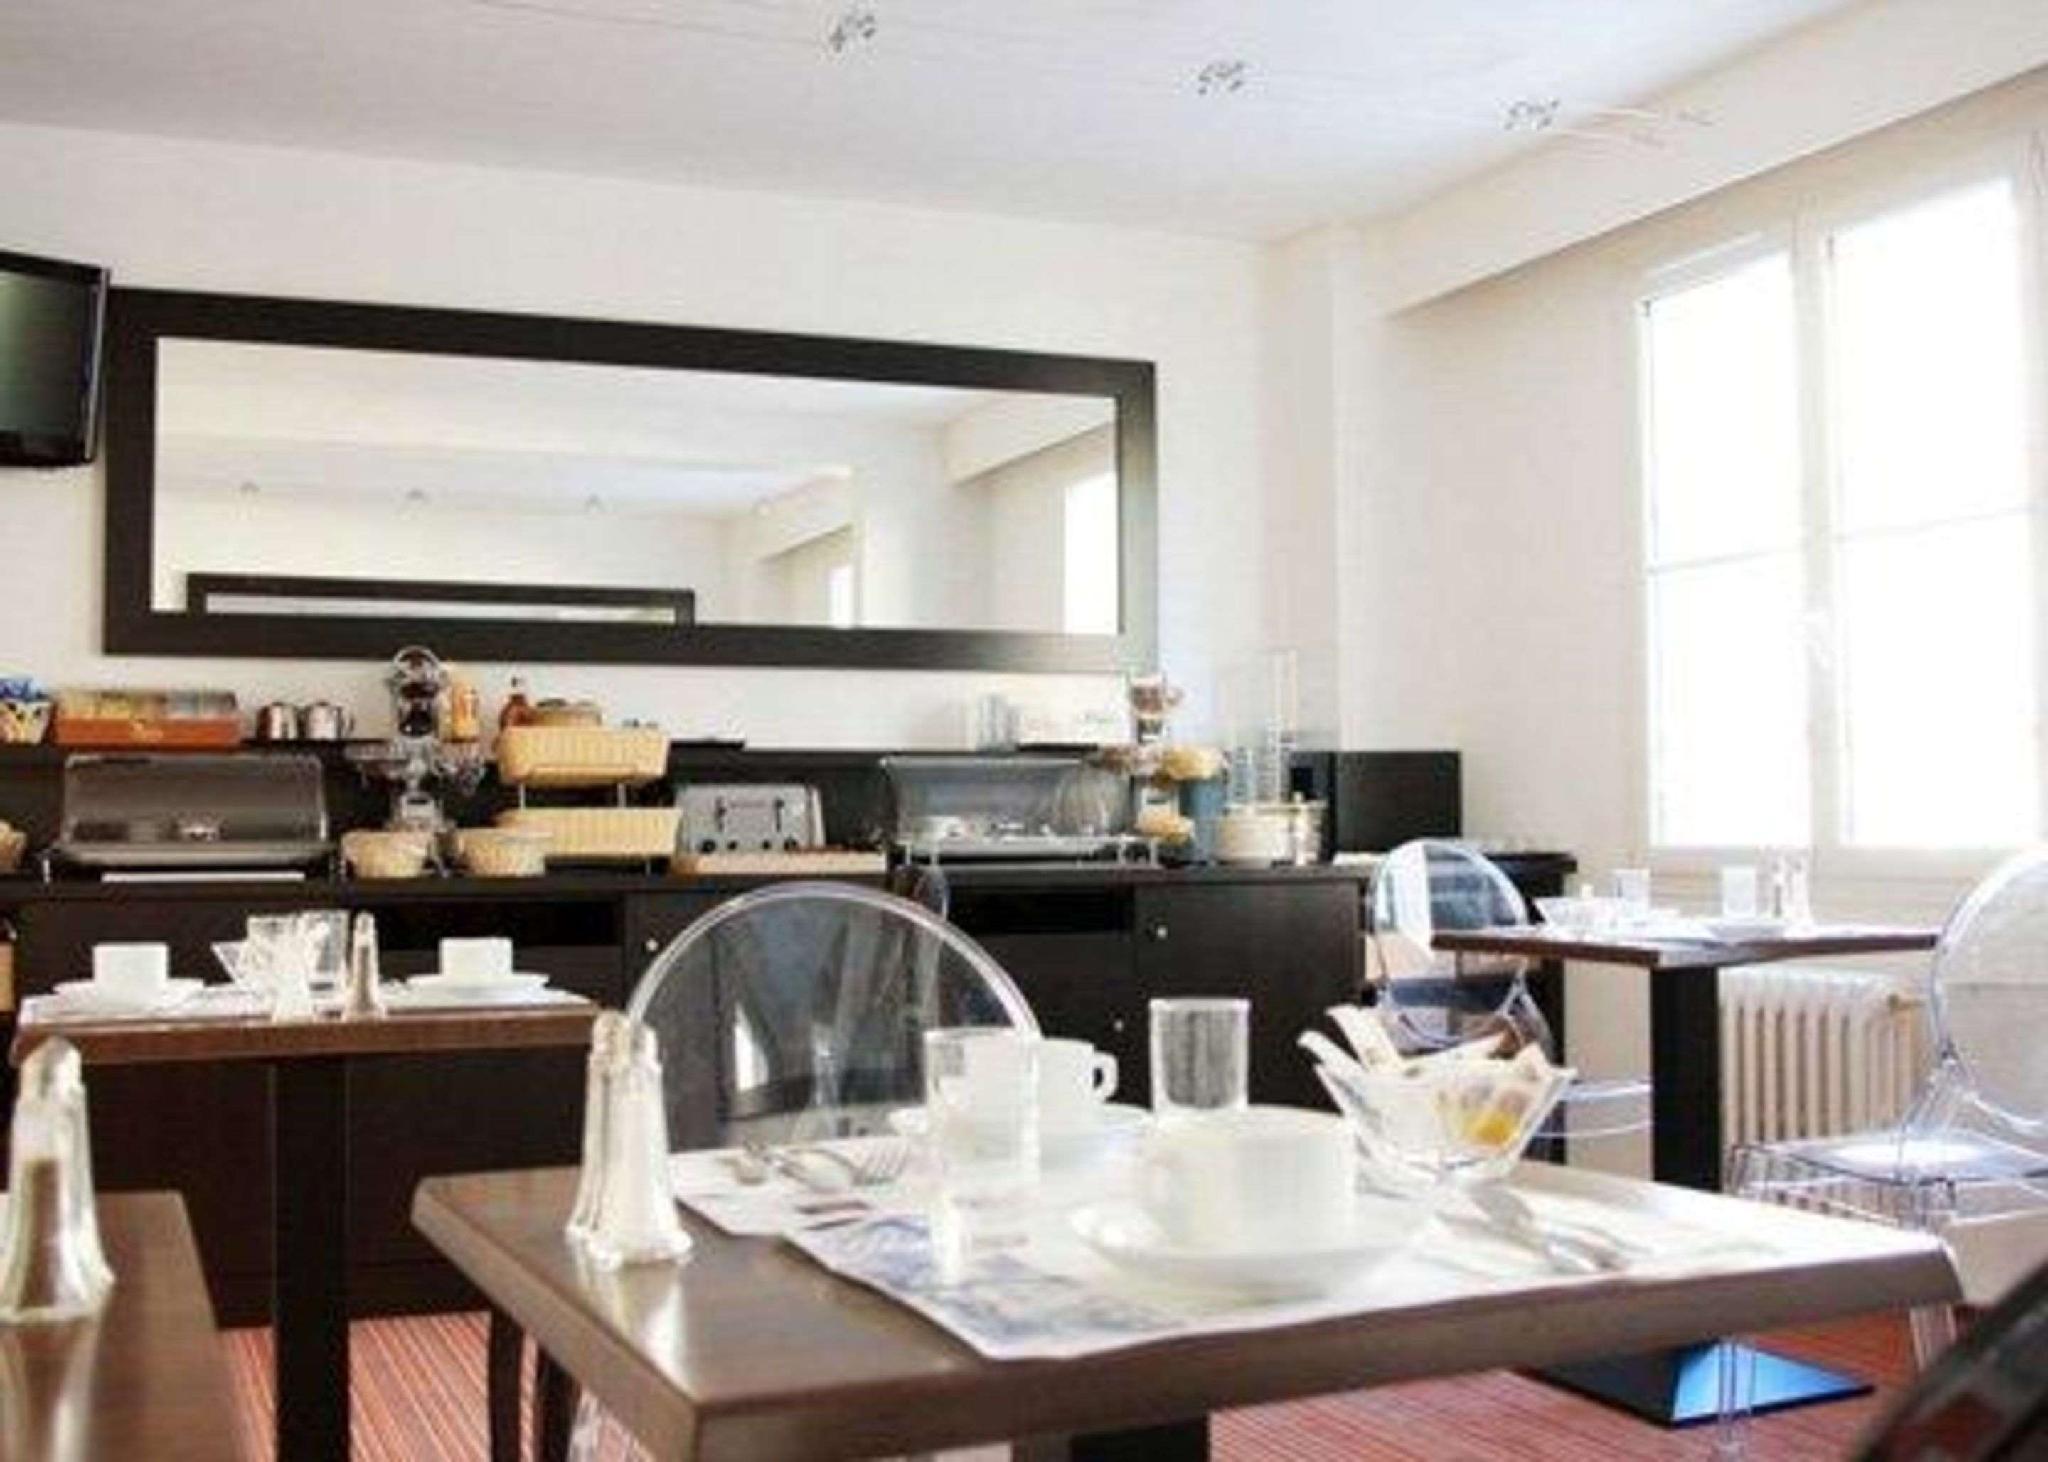 Comfort Hotel D' Angleterre Le Havre